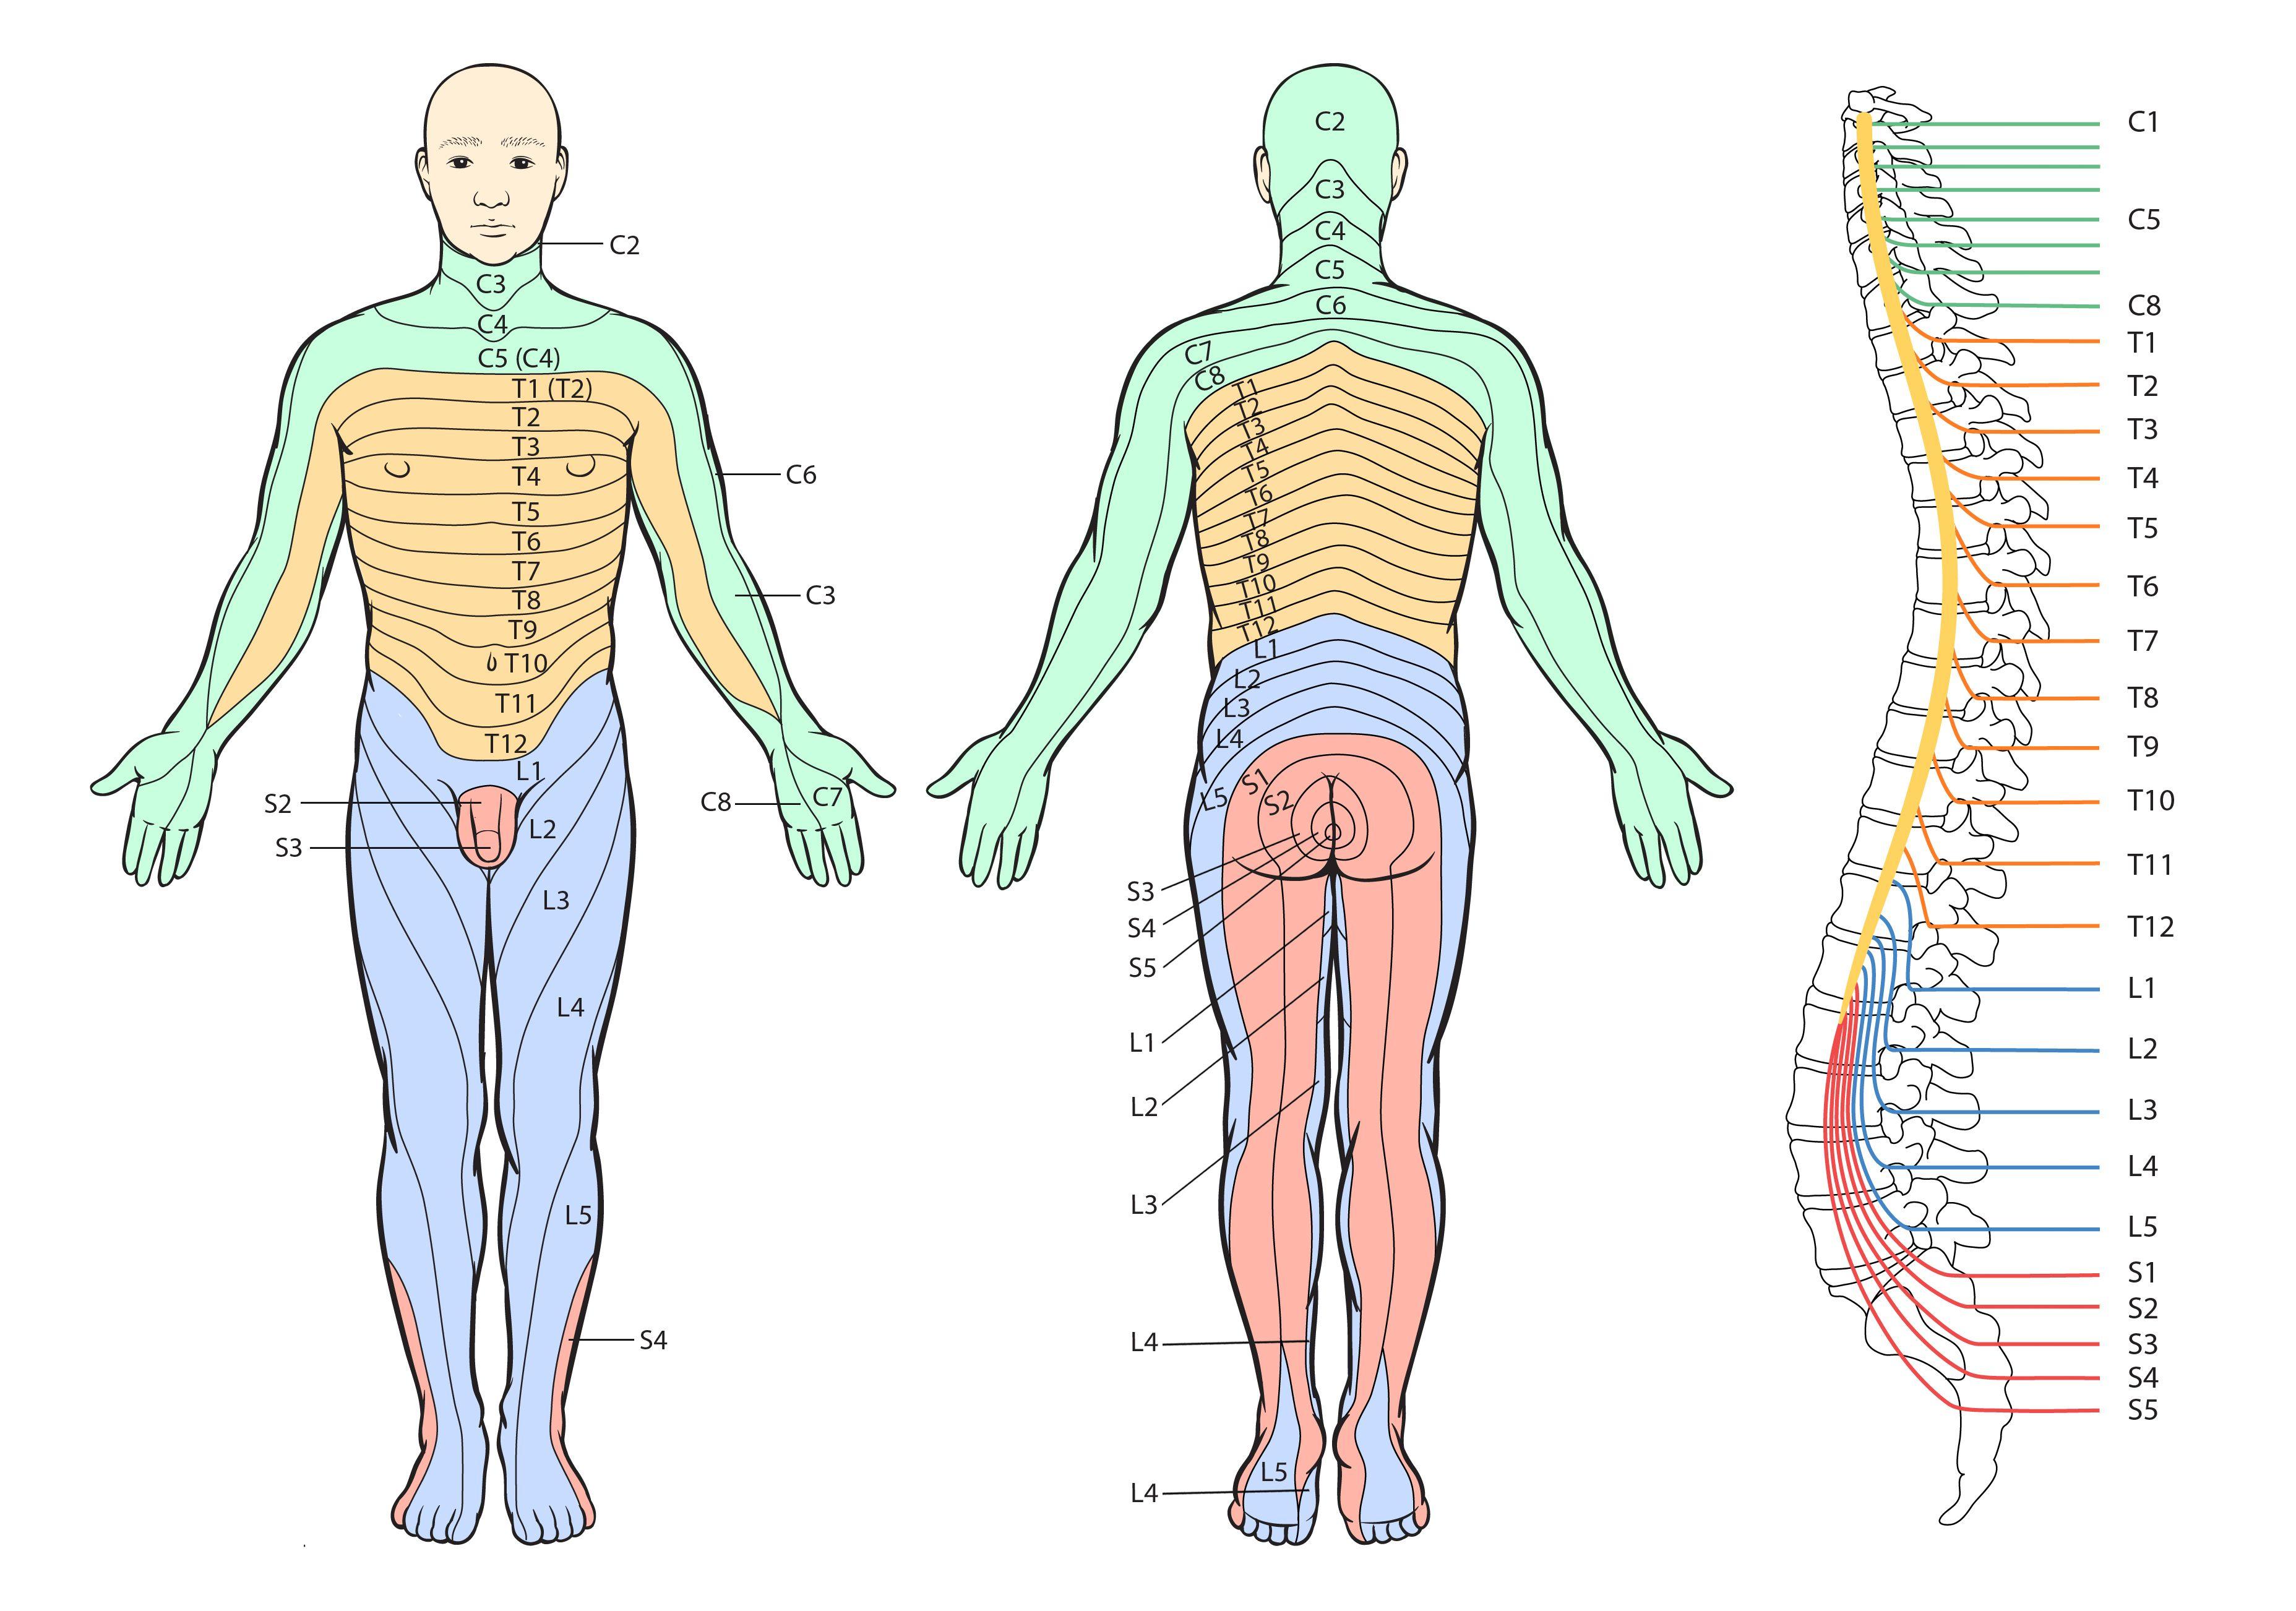 Dermatome | Kinesiology | Pinterest